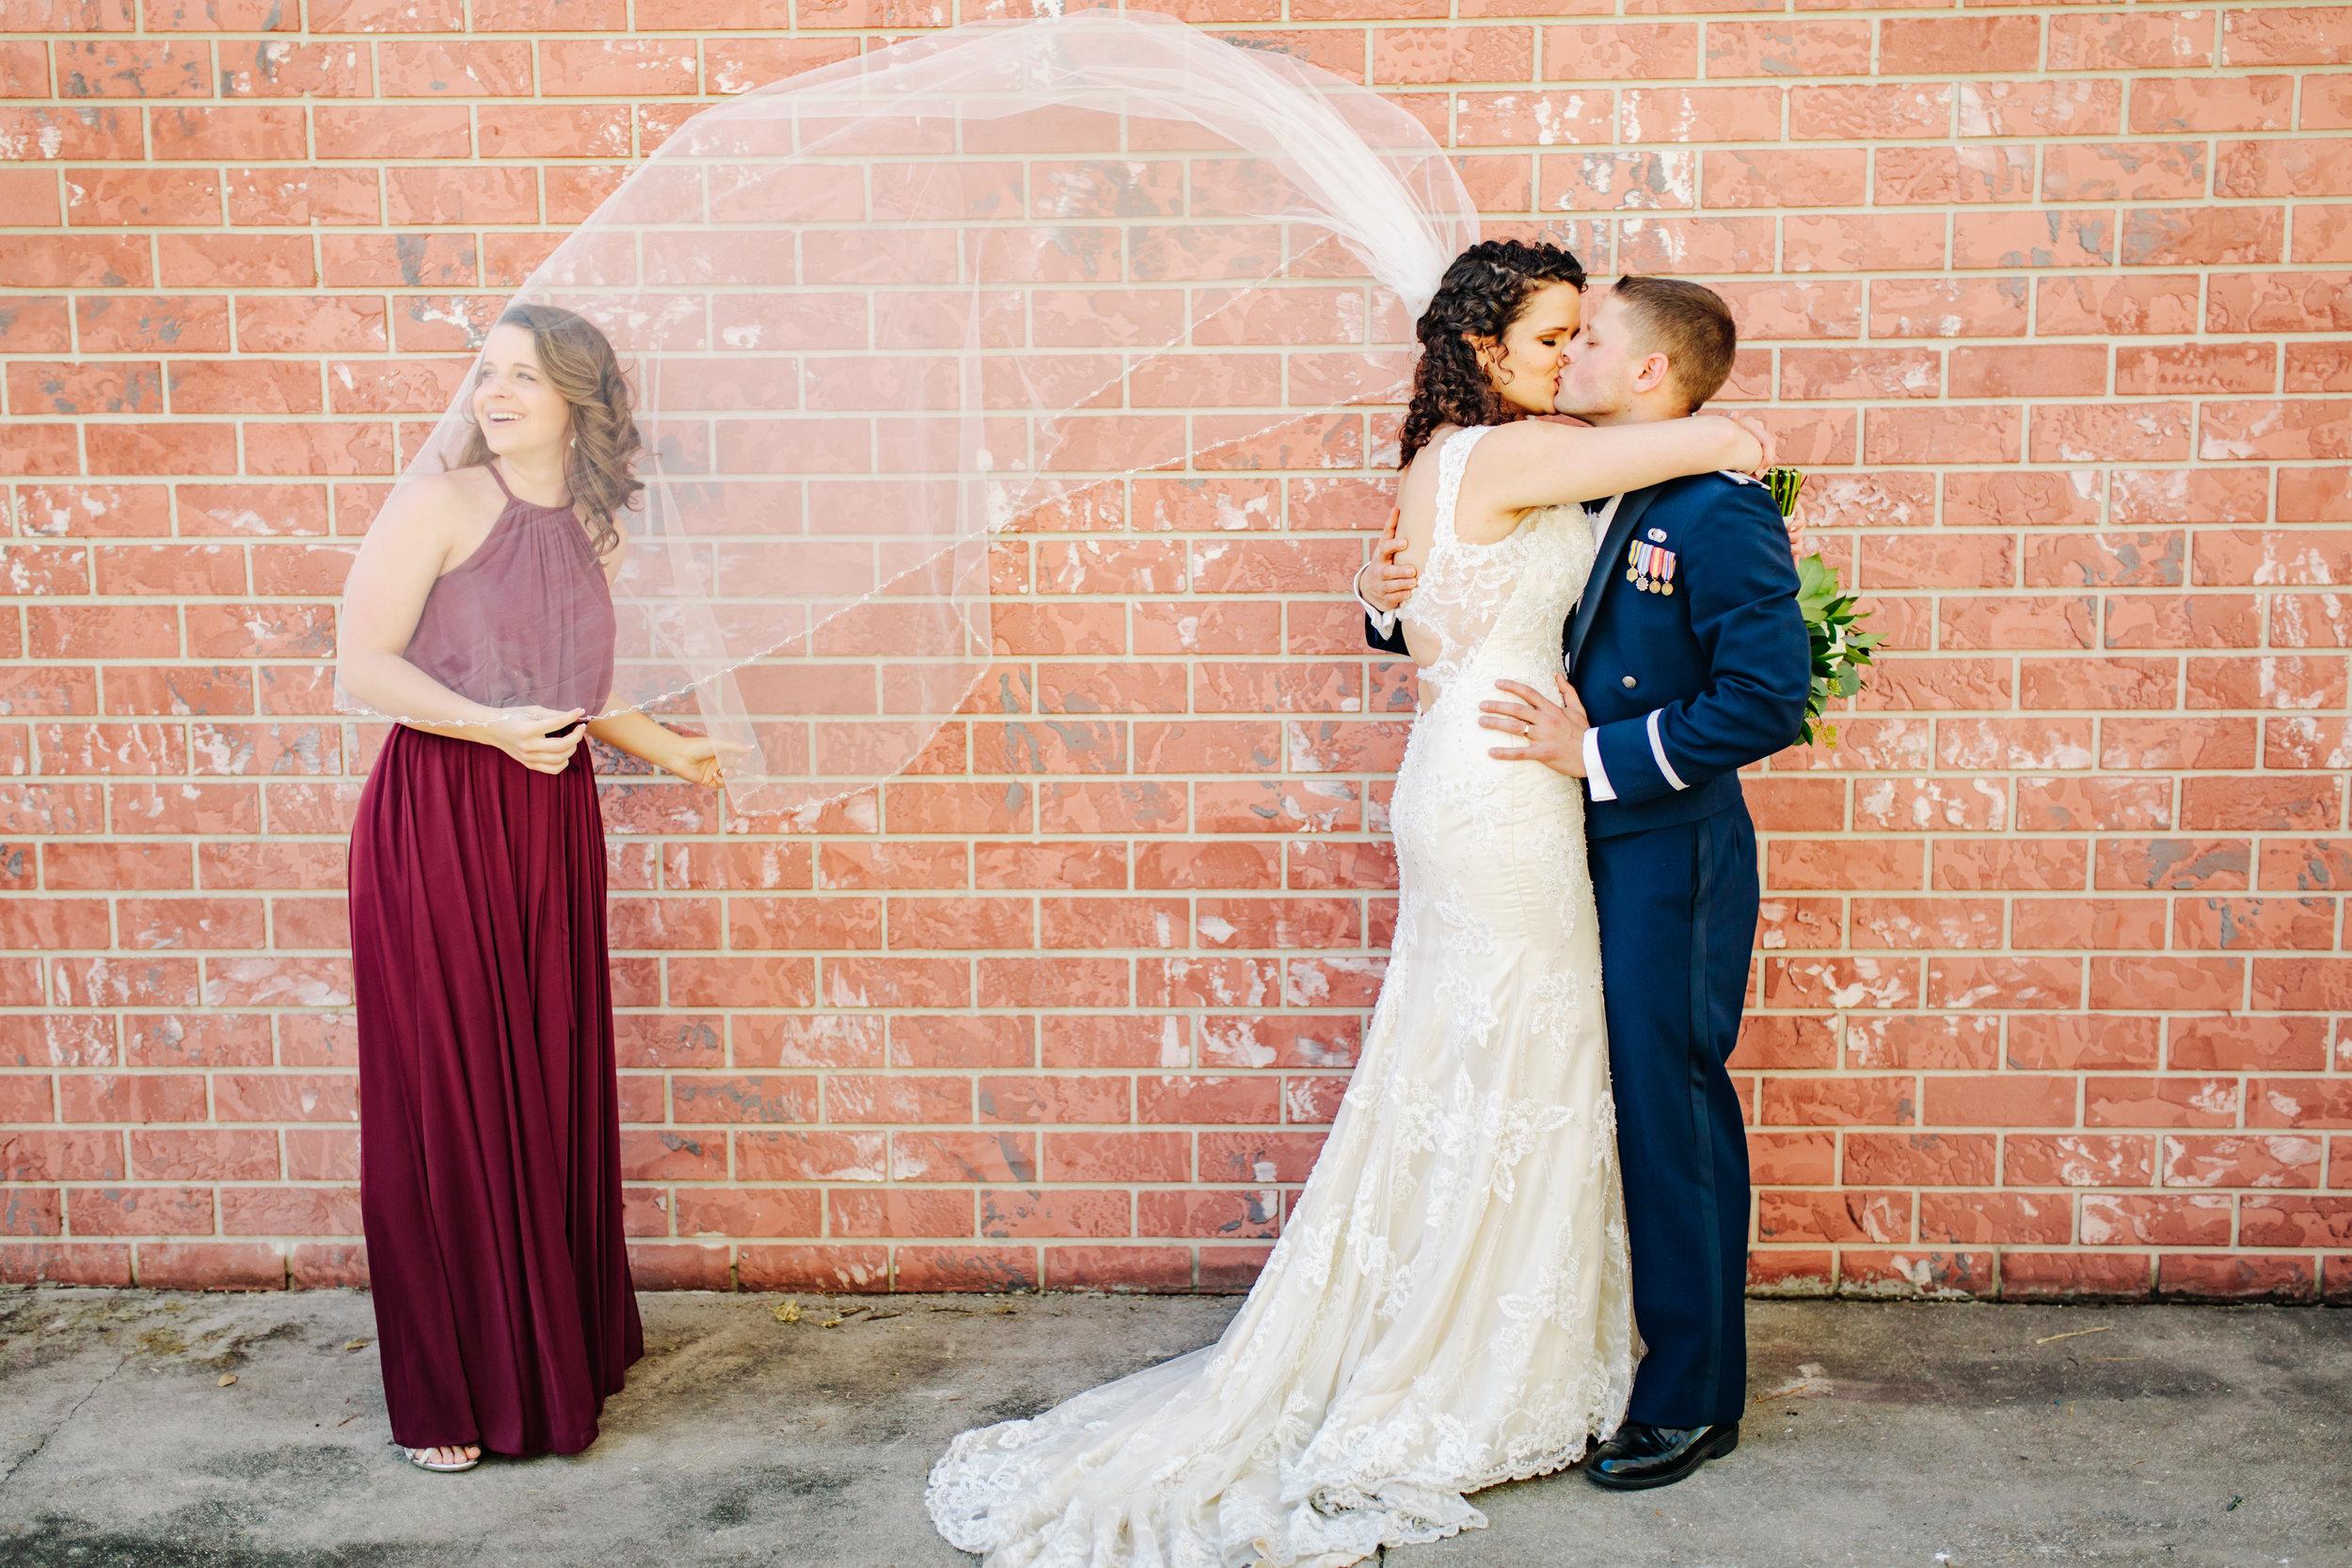 2018.03.17 Allison and Chuck Wedding Waelti Melbourne (485 of 569).jpg